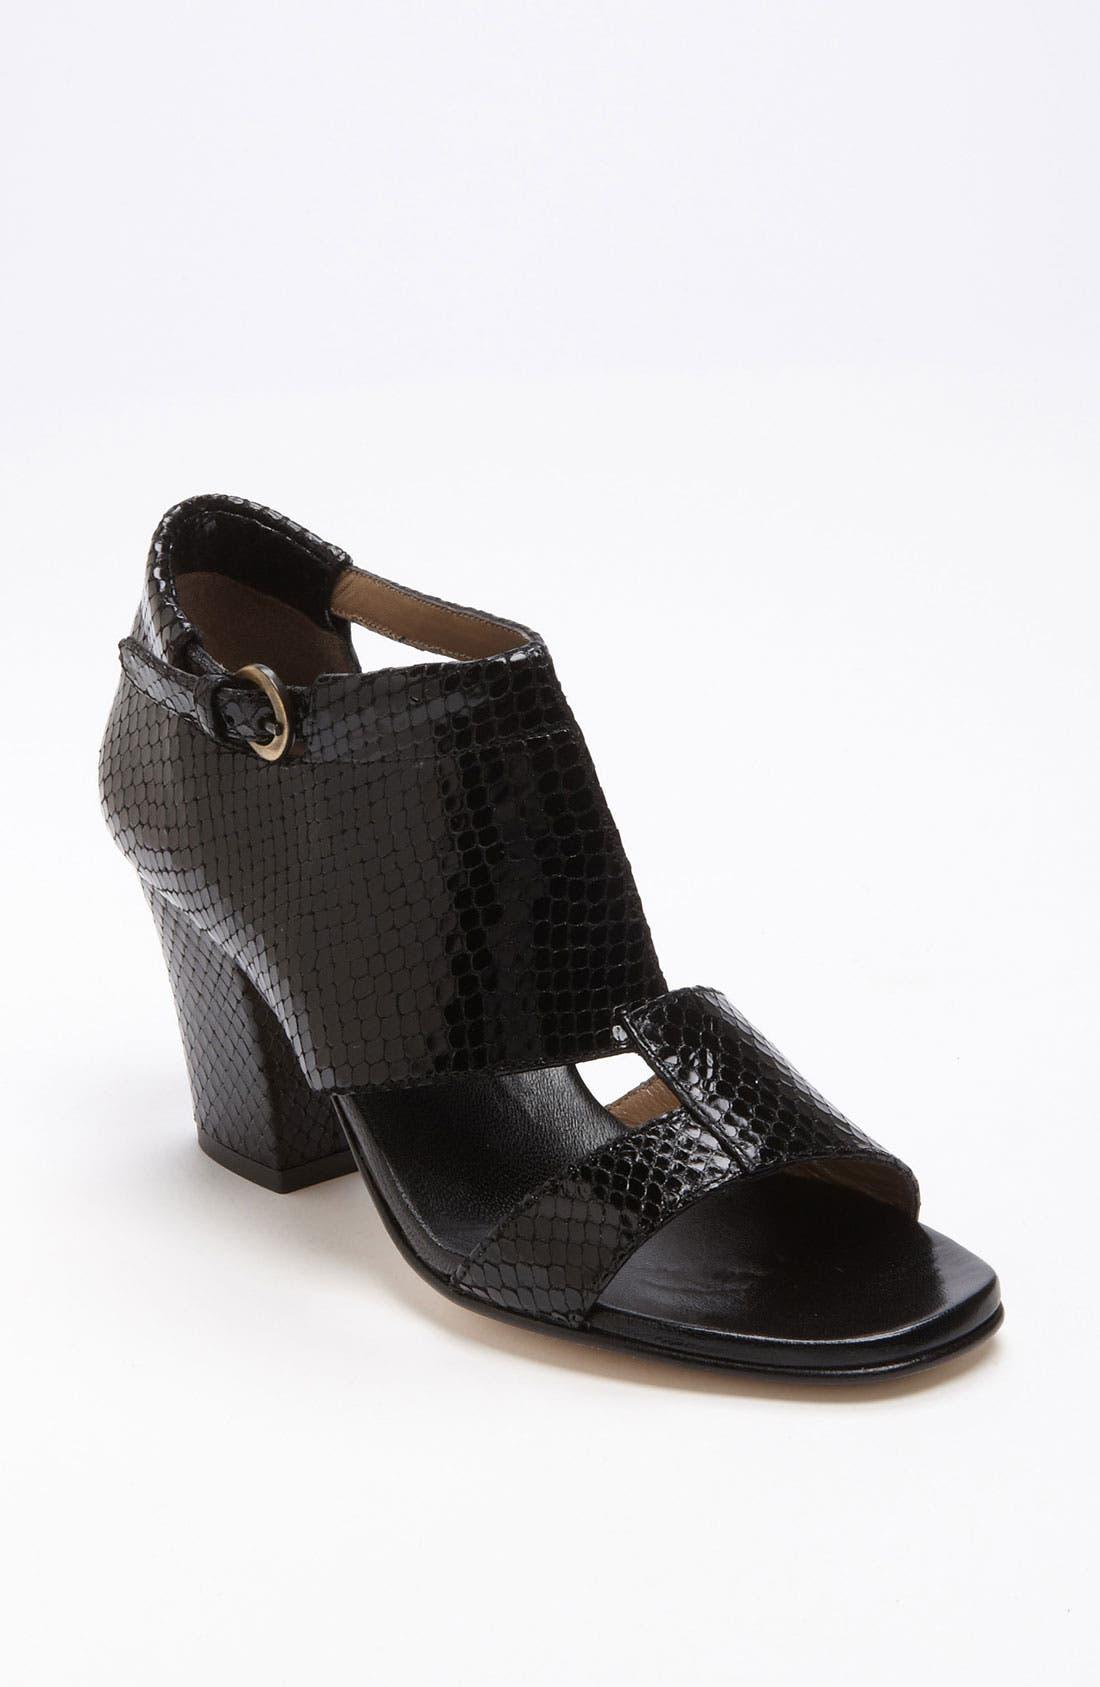 Main Image - Anyi Lu 'Electra' Sandal